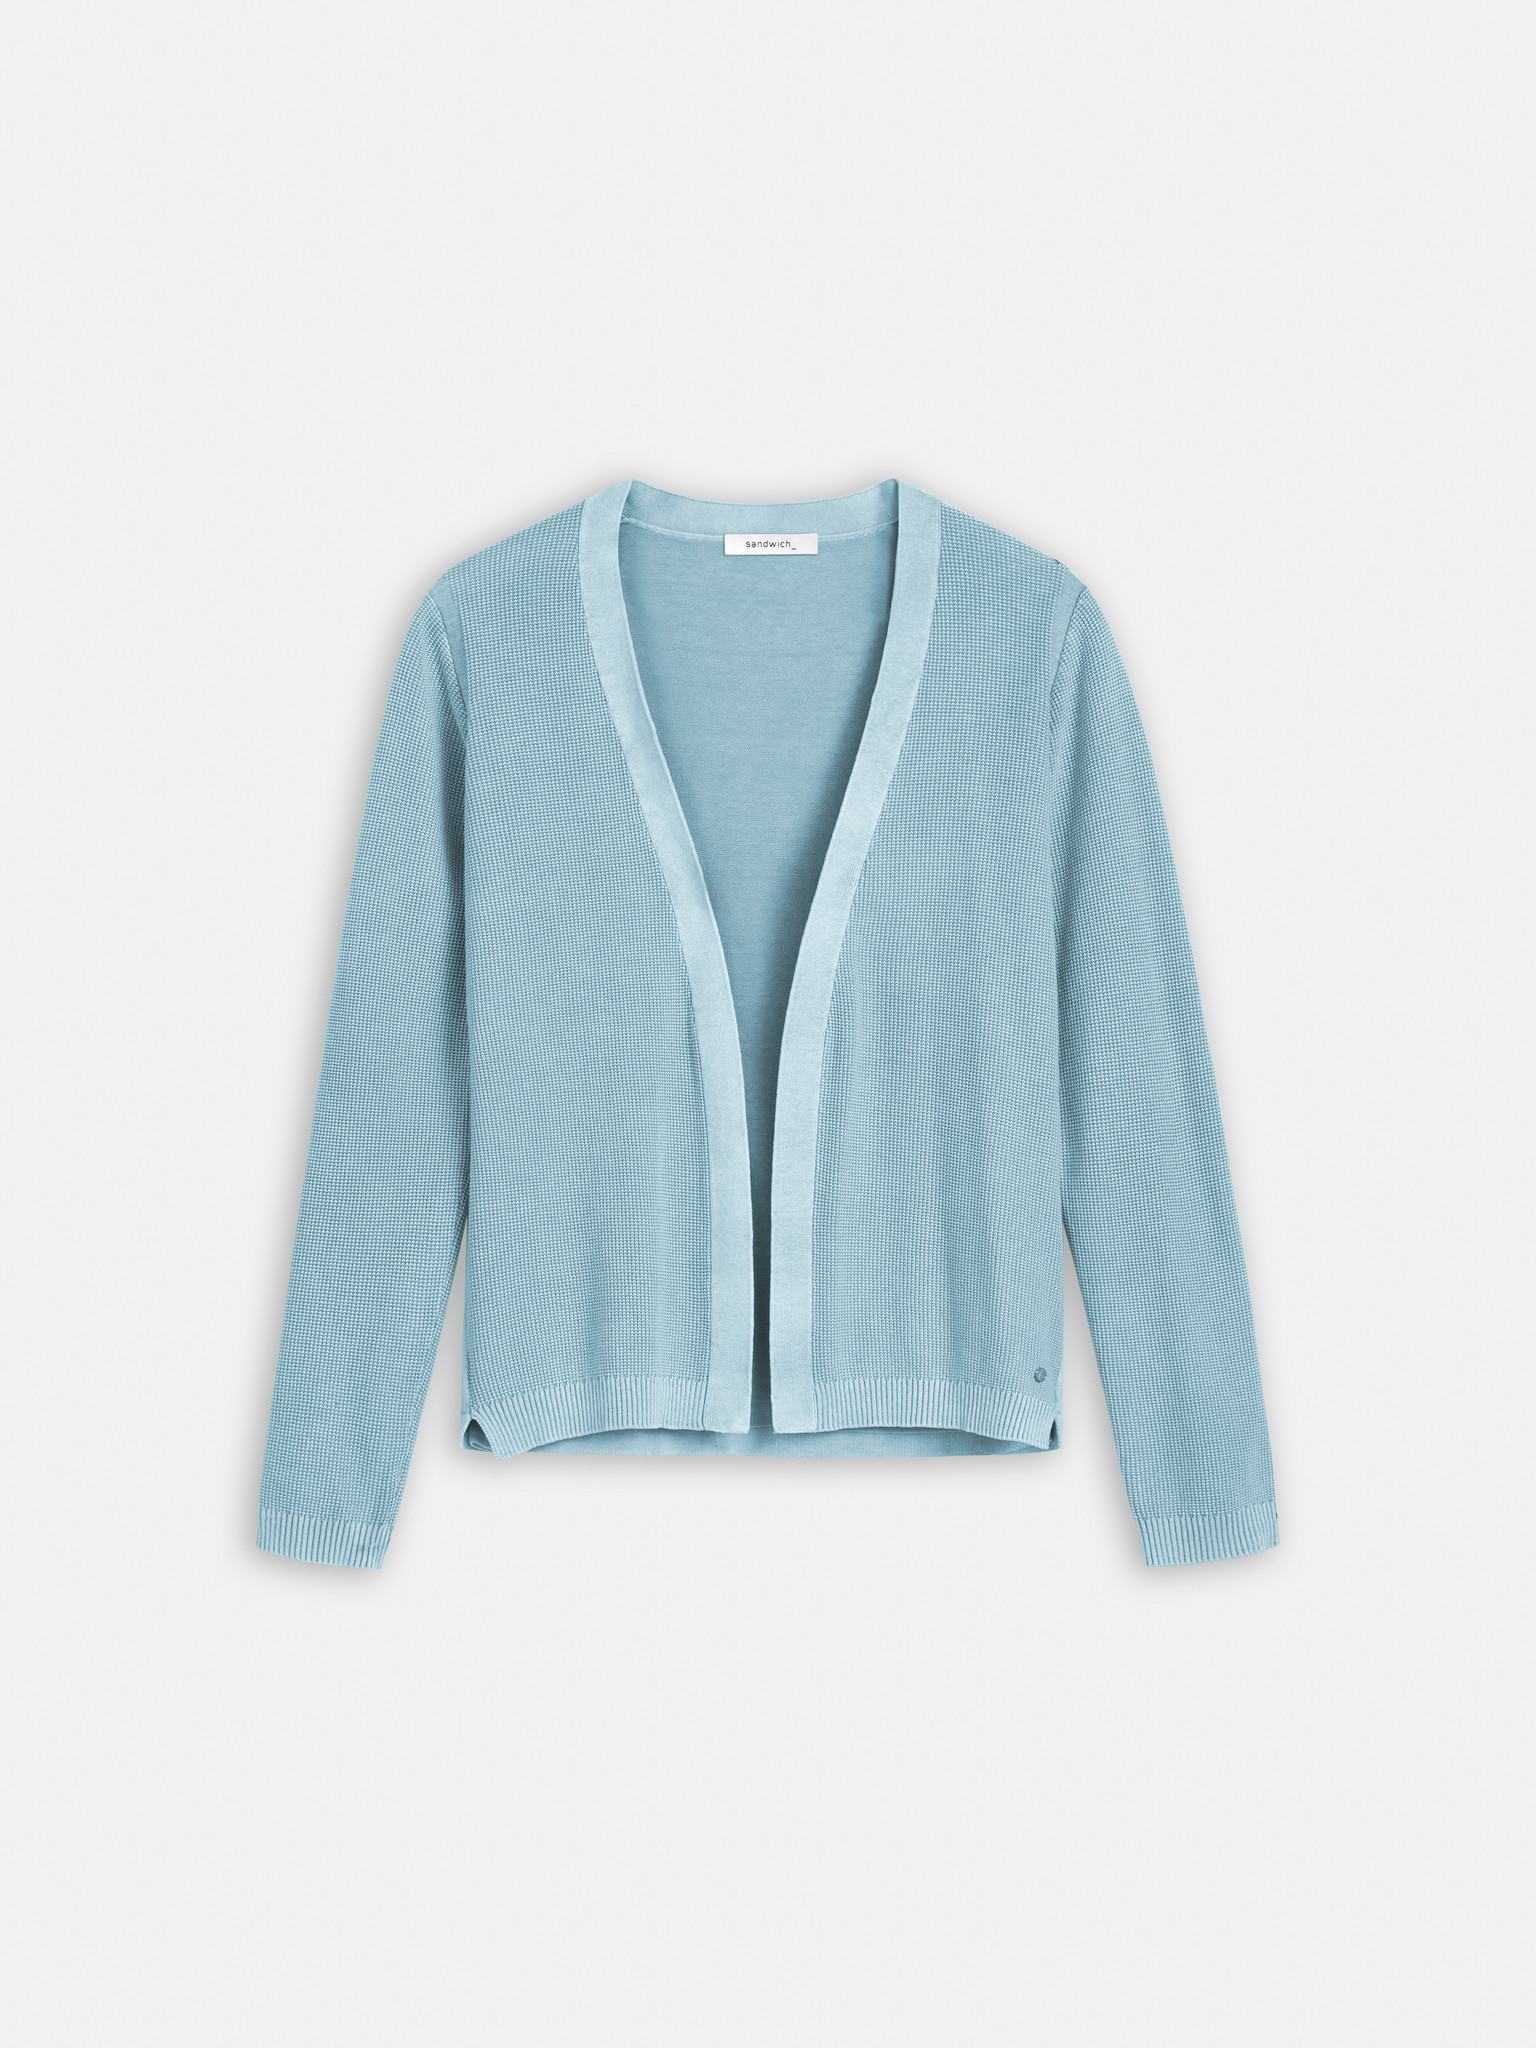 Textured Knit Cardigan - Blue Shadow